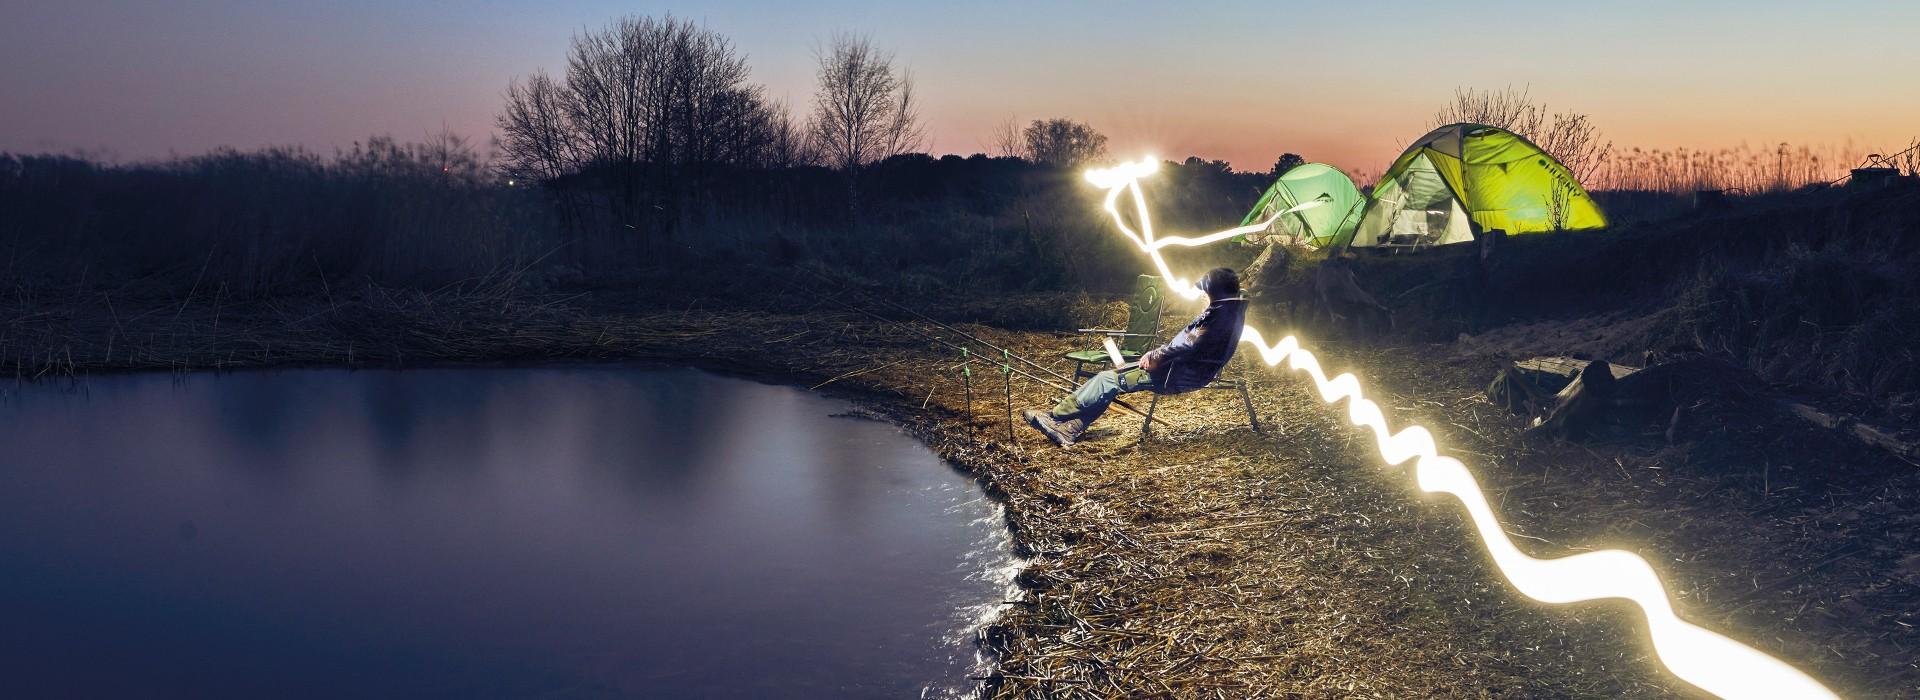 Deeper Power Lantern아웃도어 할동을 밝혀 드립니다.